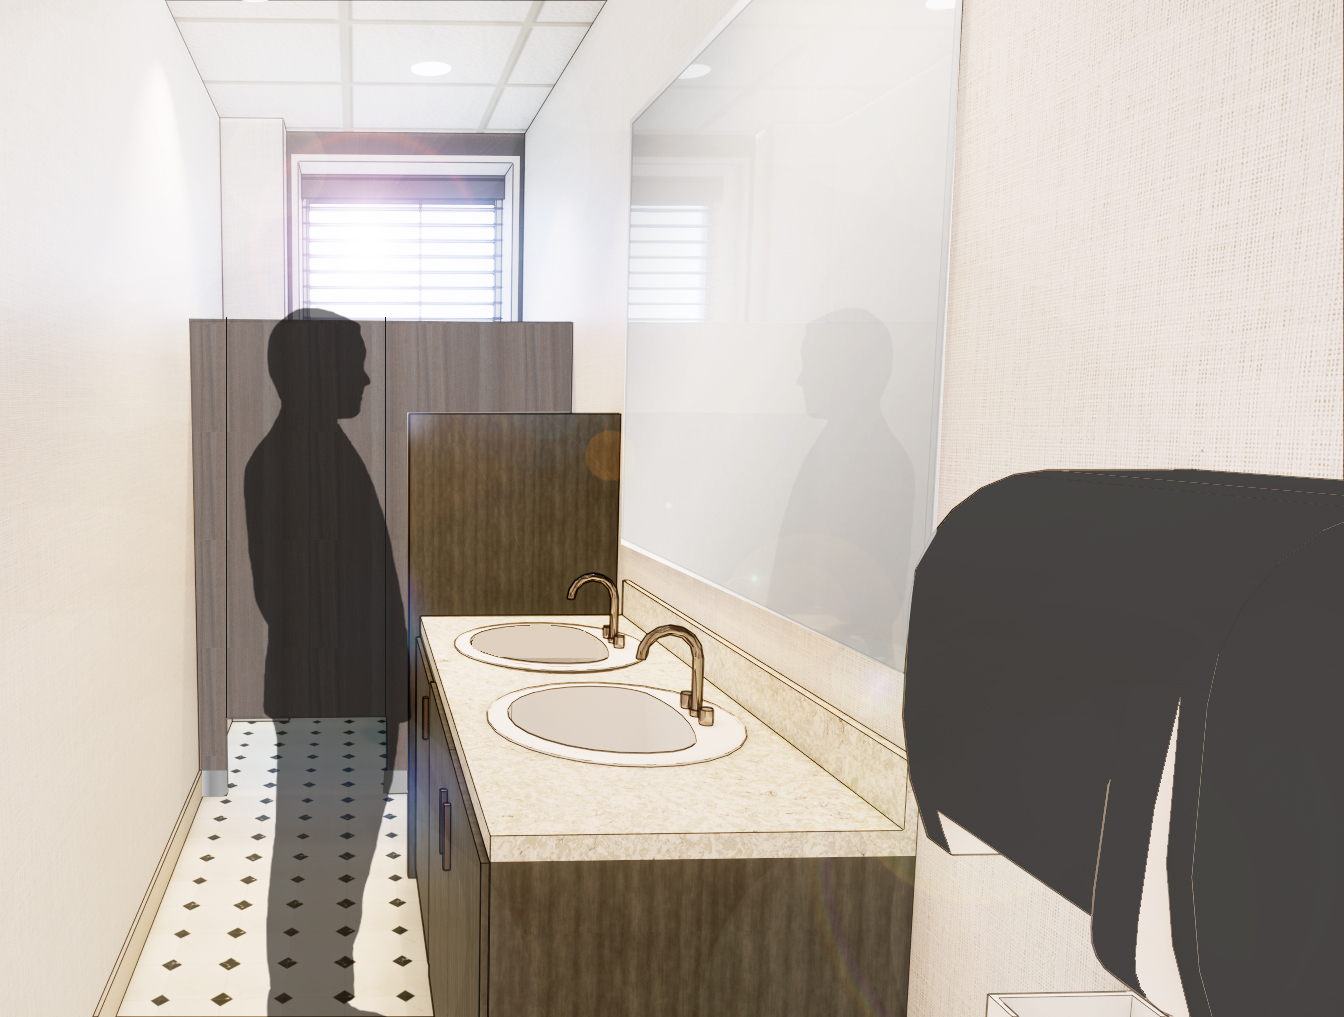 Small Men's Restroom View 1.jpg